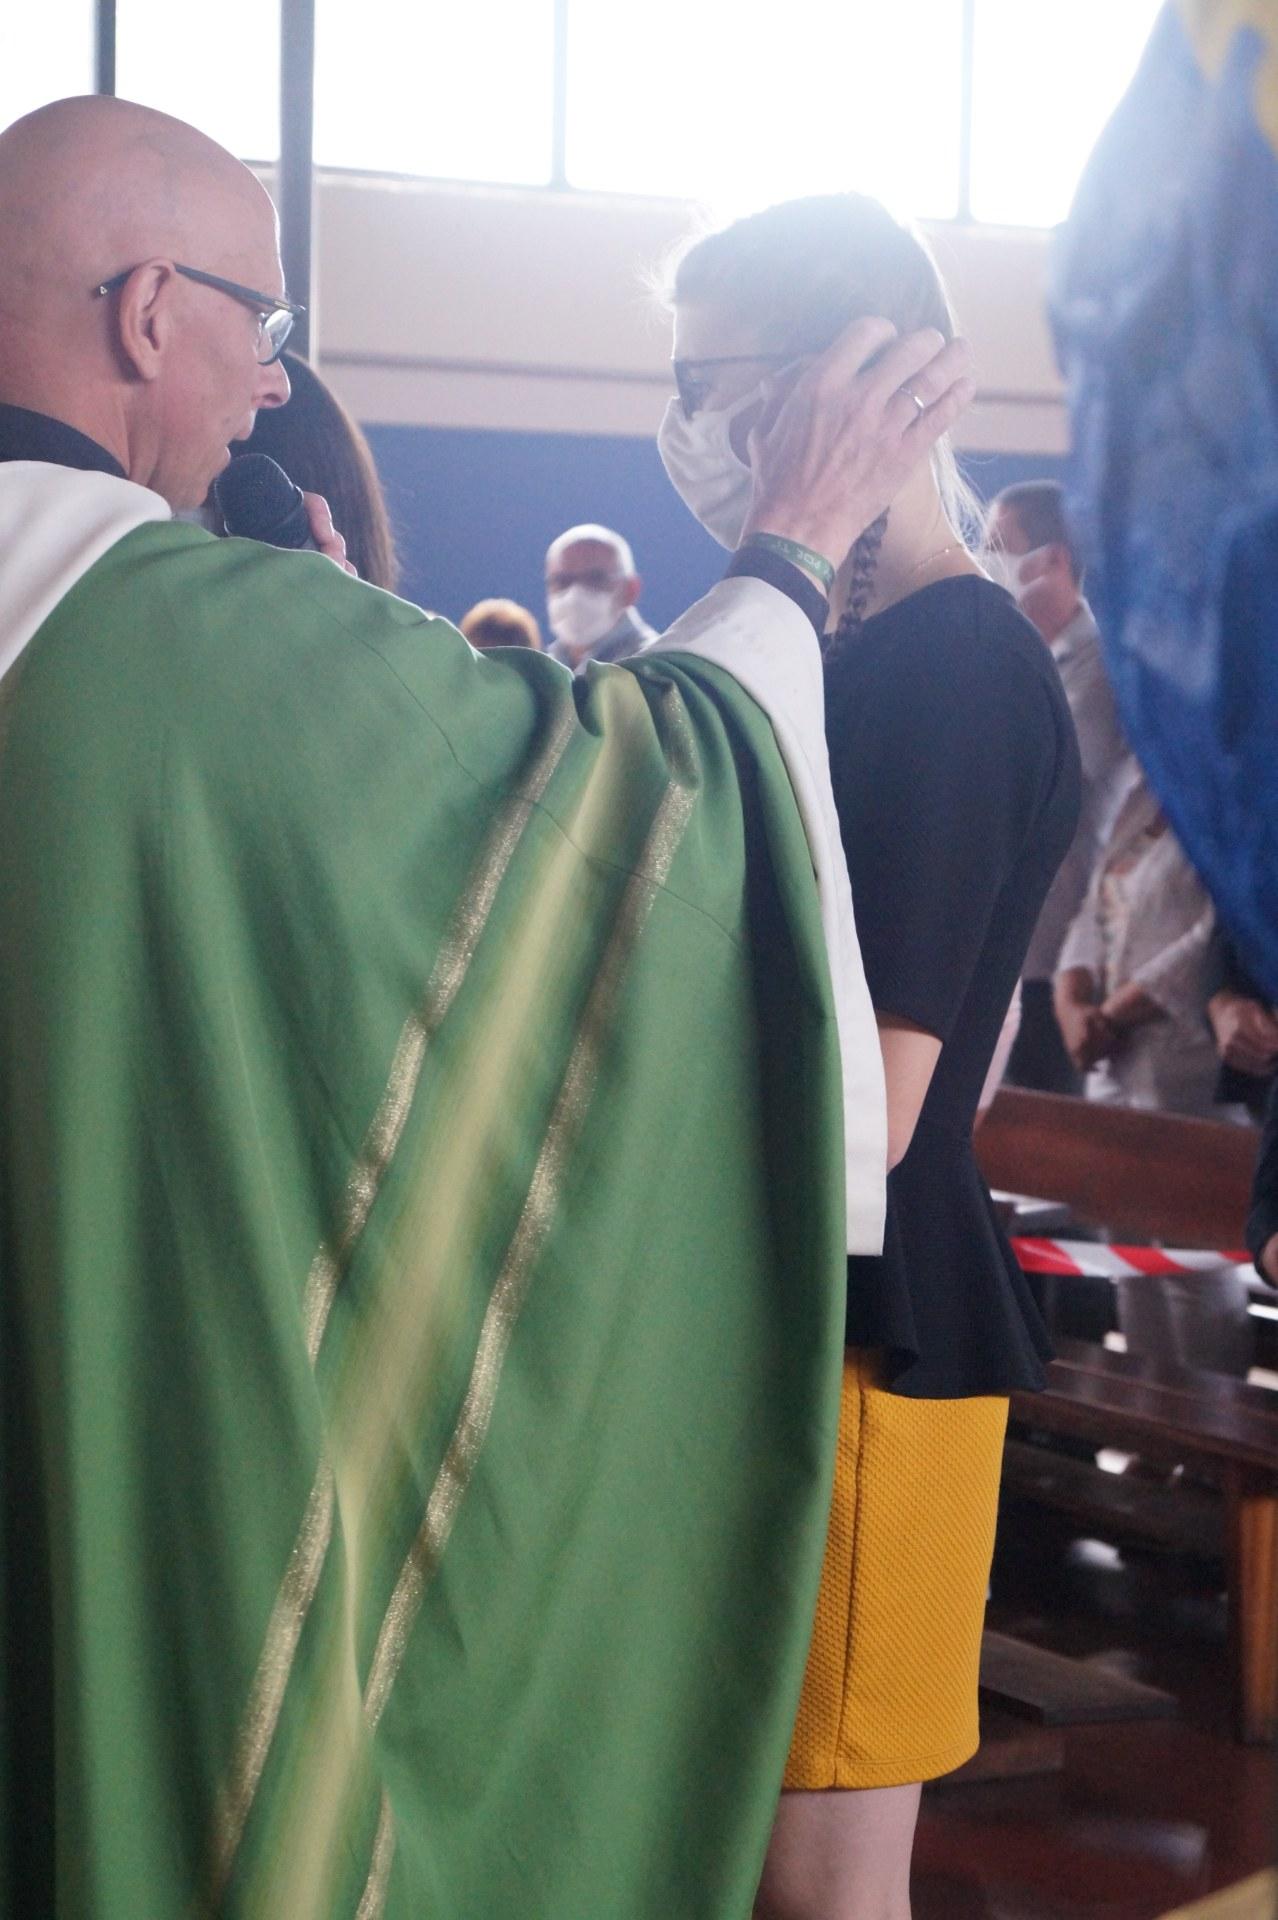 entree en catechumenat 6 sept 2020 (19)